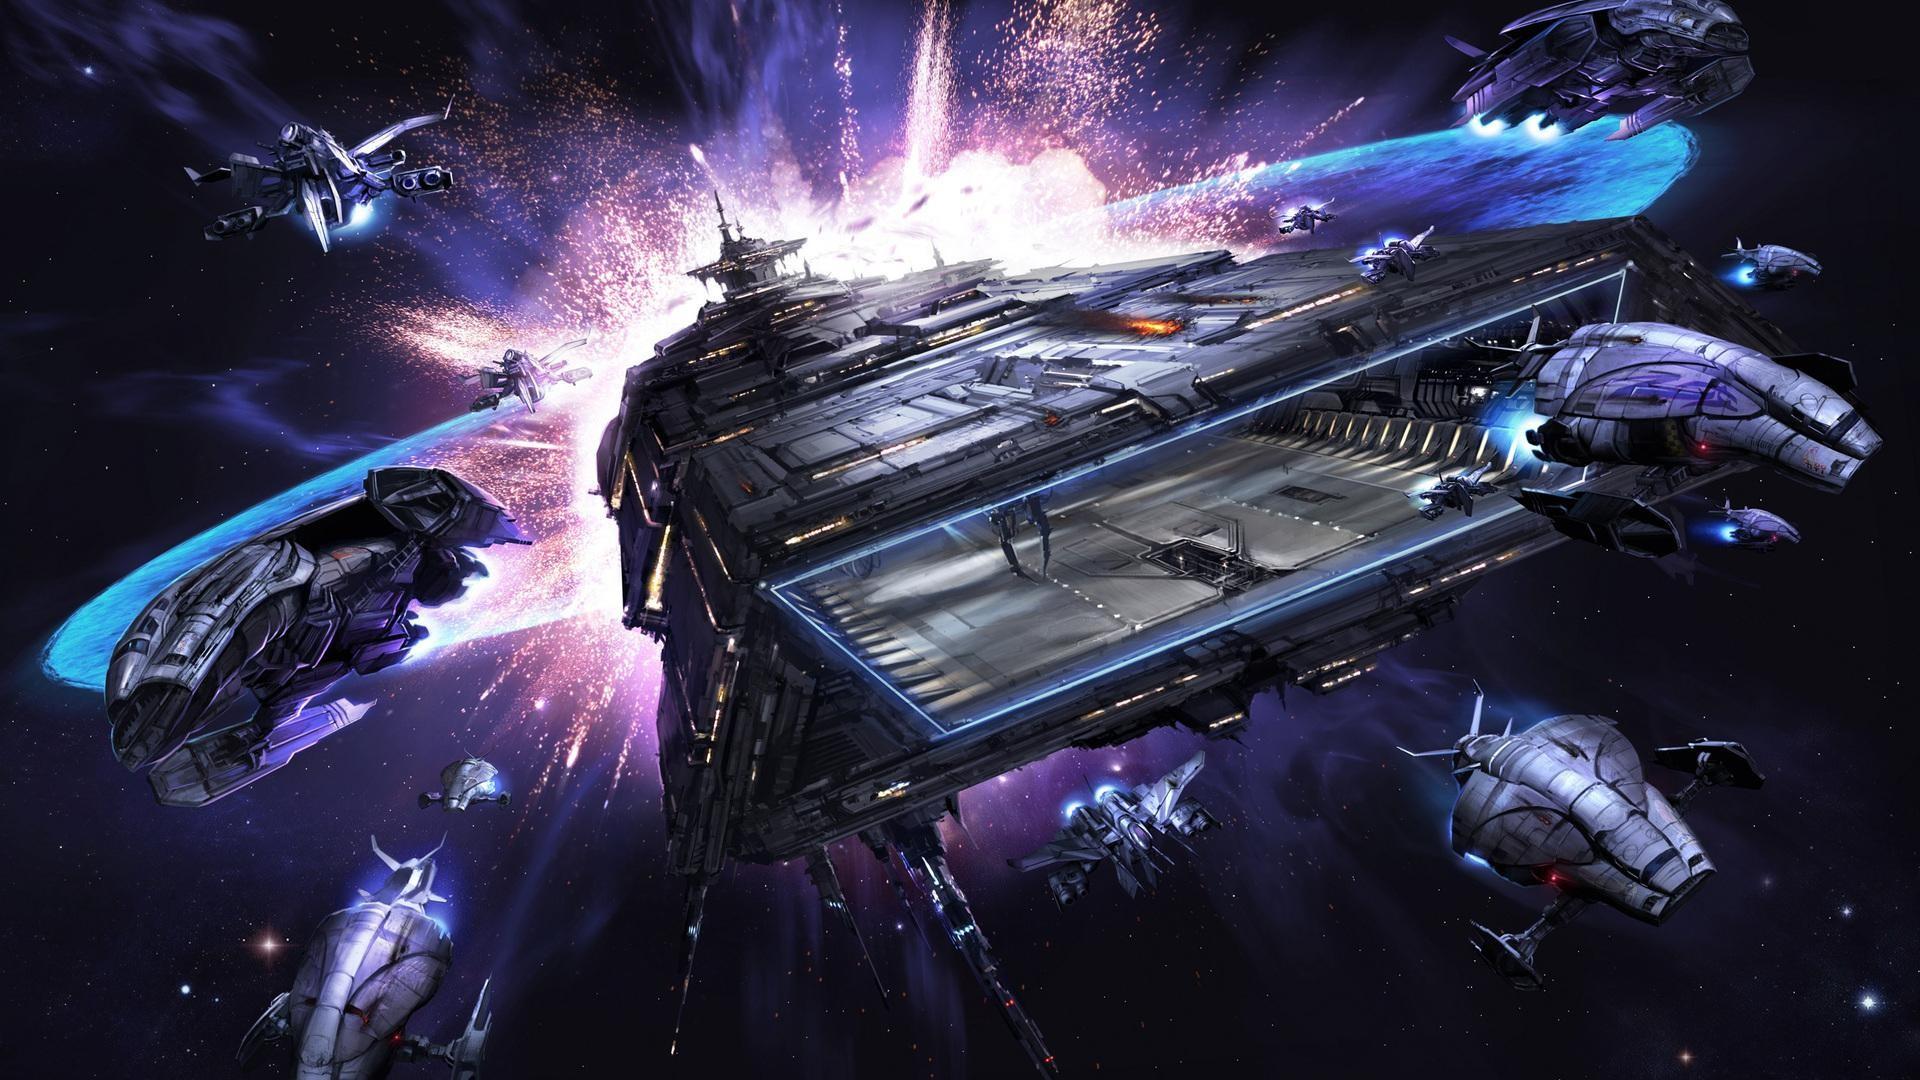 spaceships xrebirth space spaceship wallpaper 1920x1080